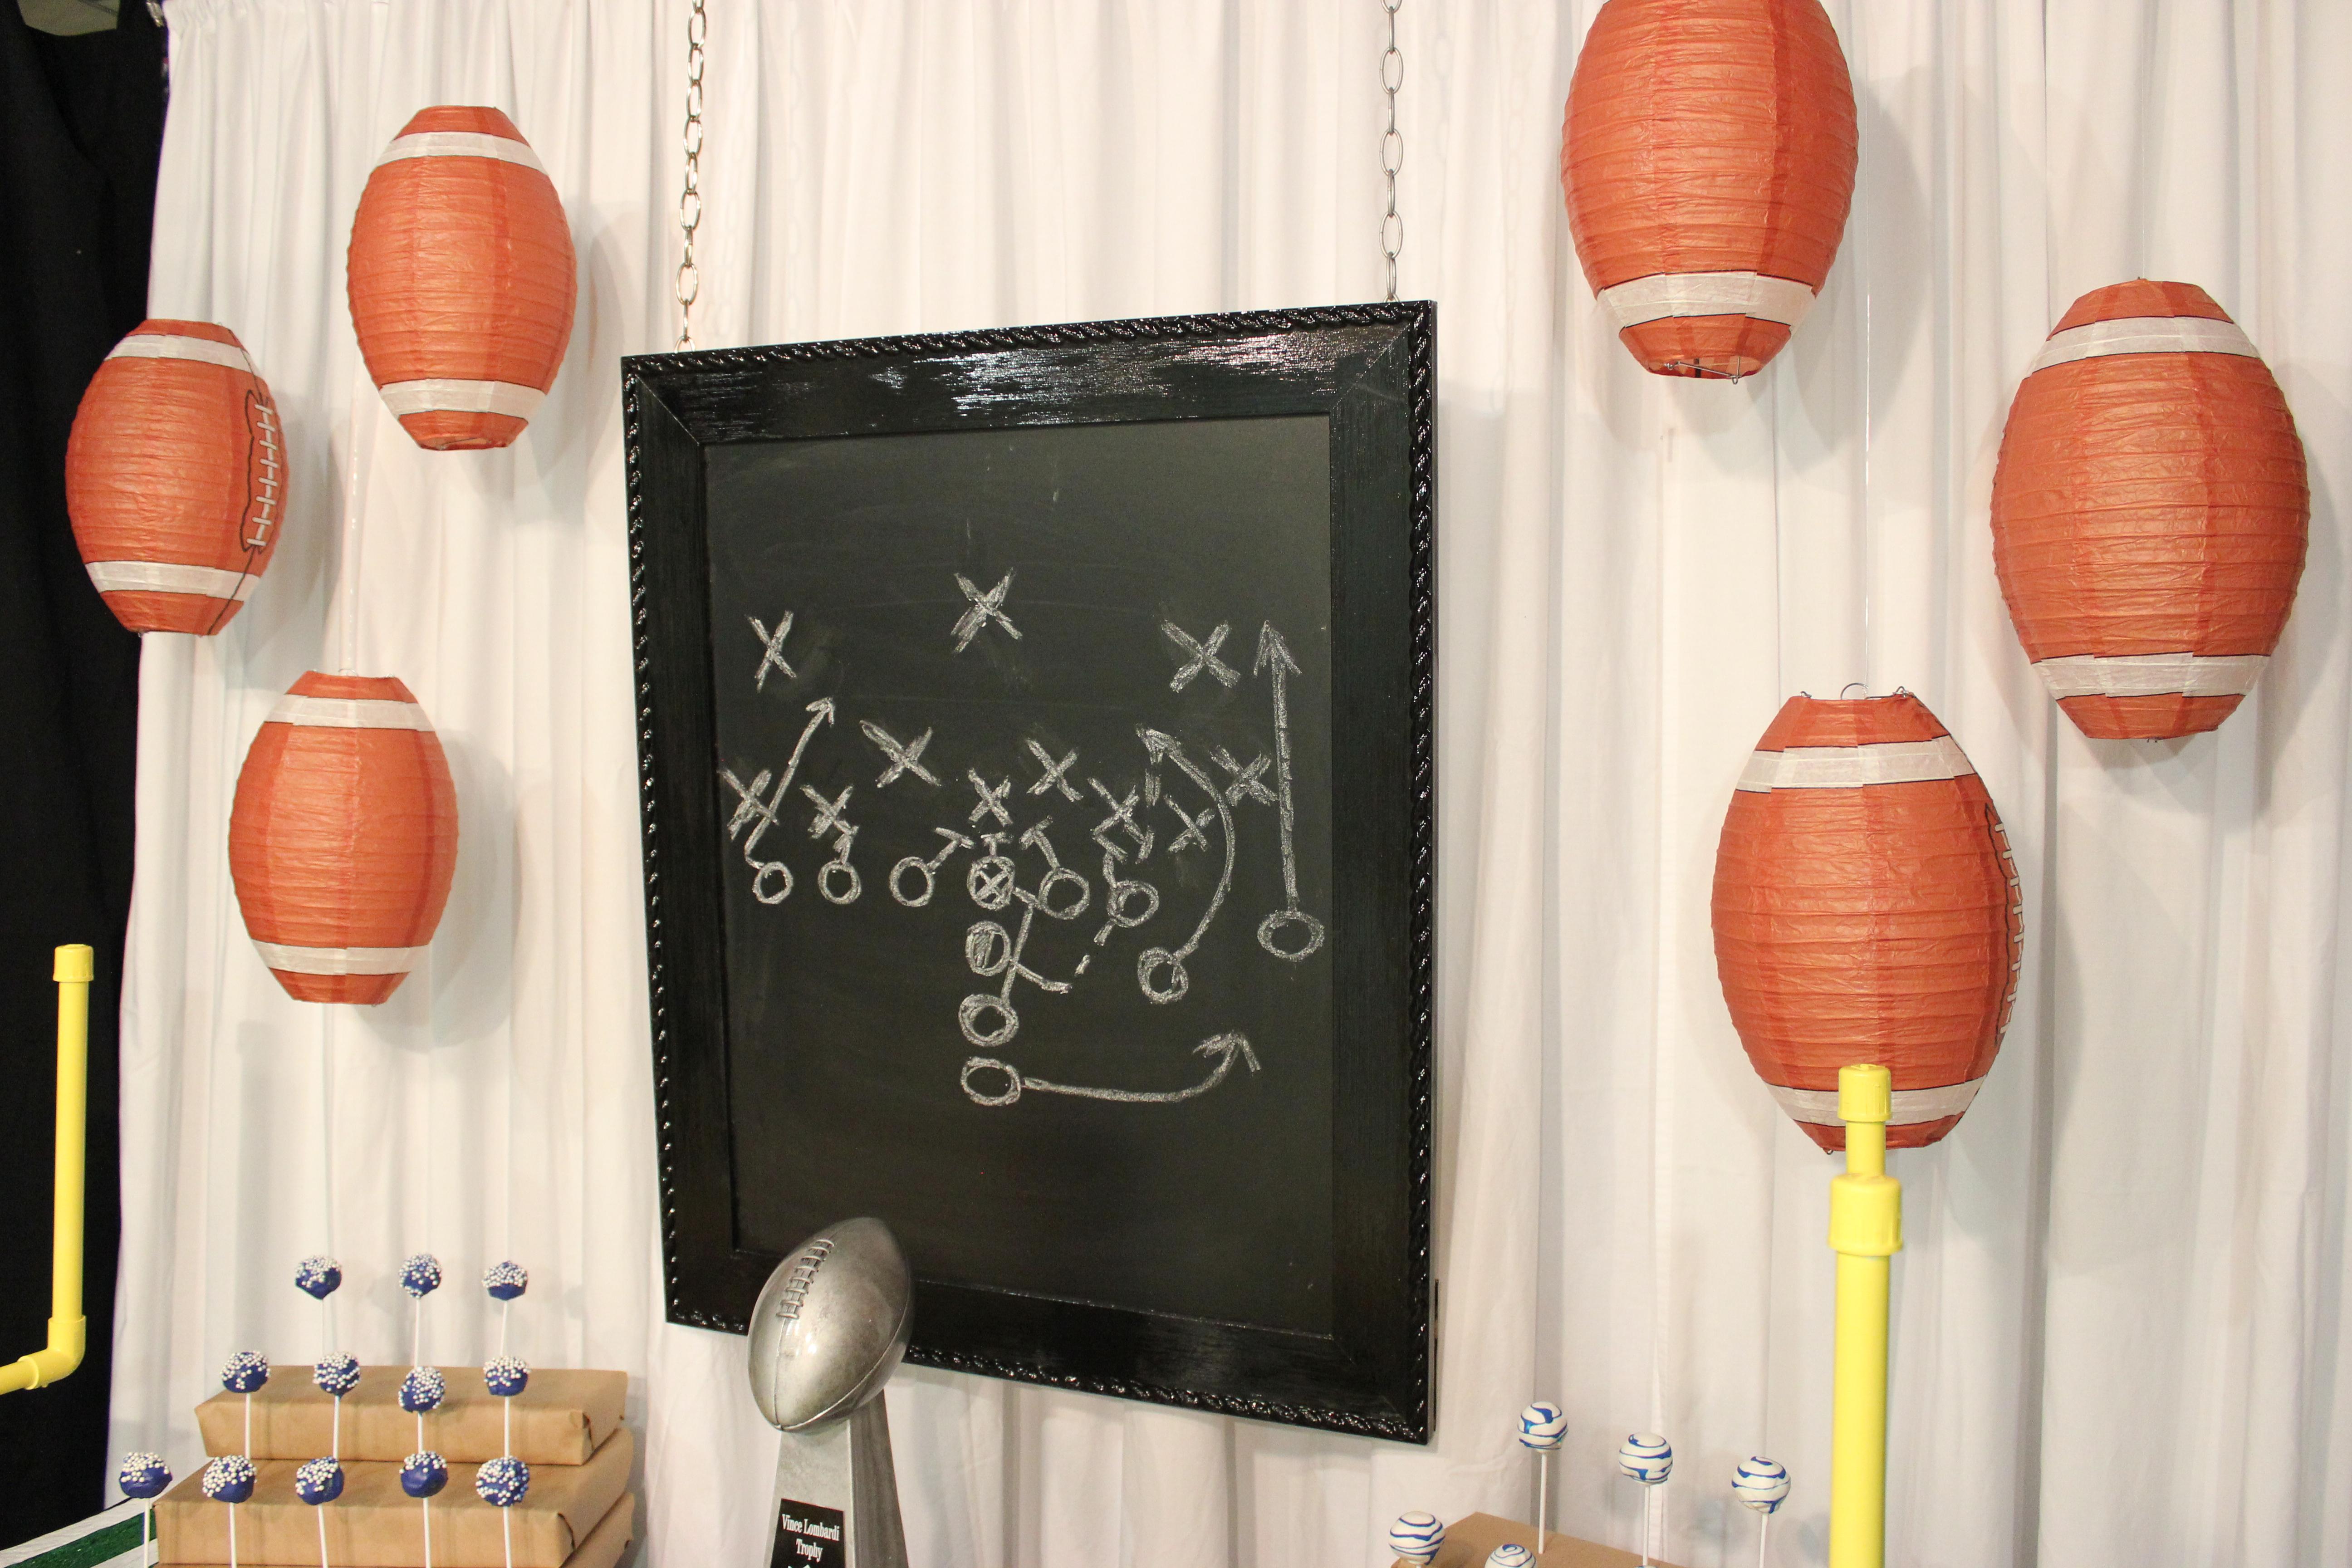 IMG_2089 - Chalkboard and Lanterns